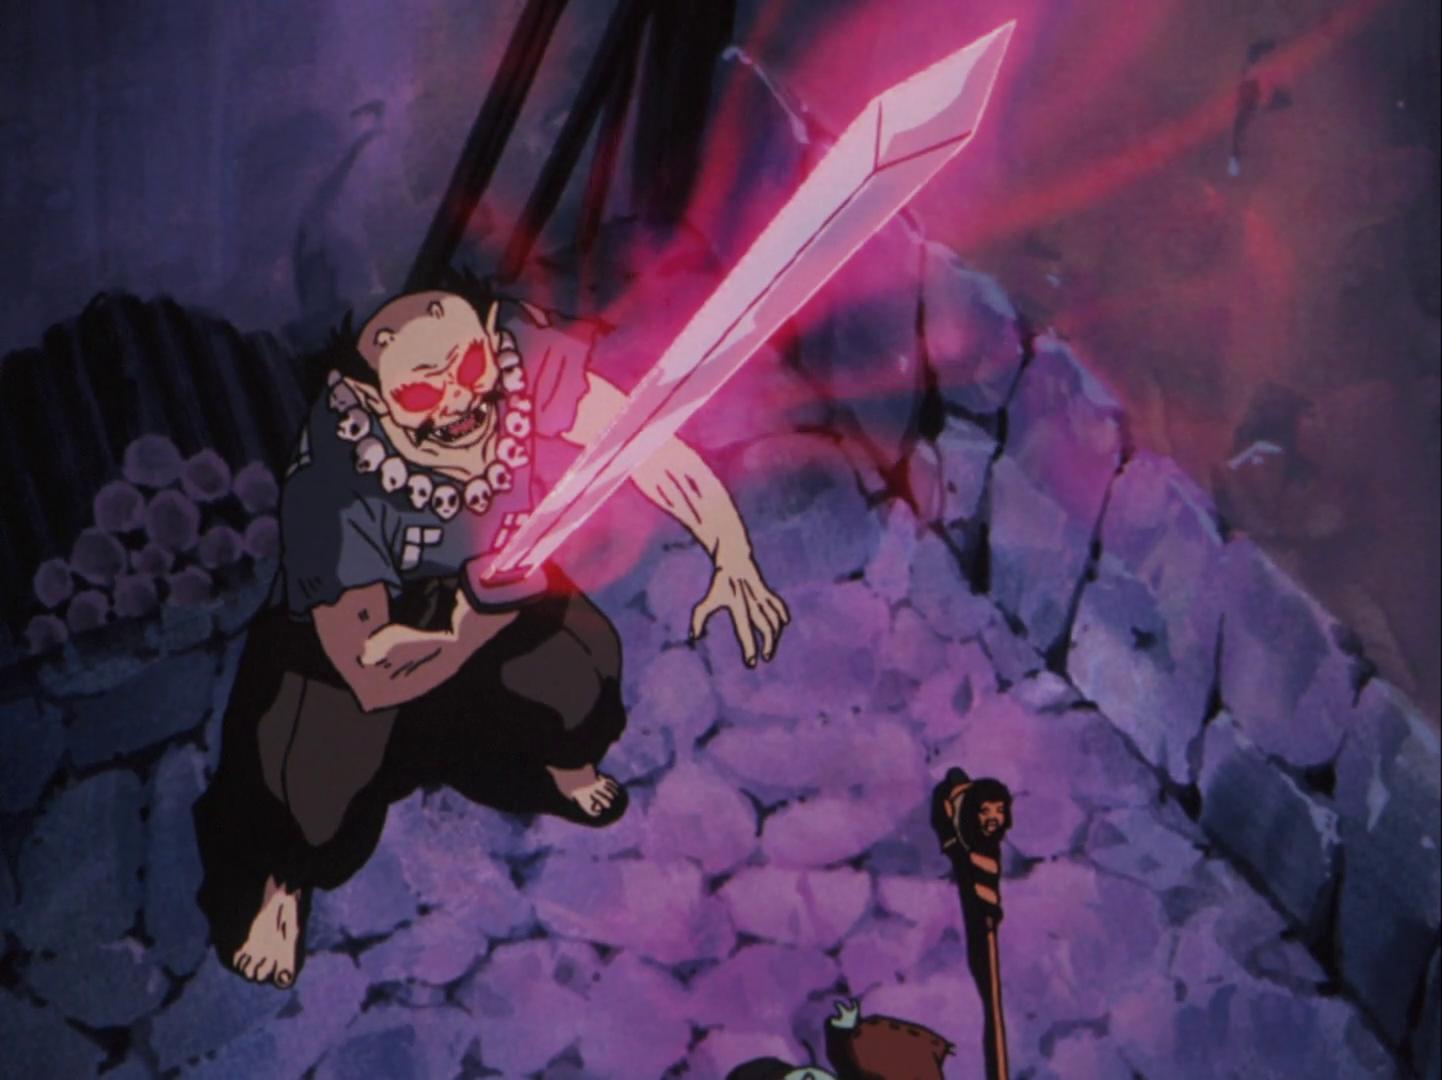 File:Kaijinbo's evil sword.png